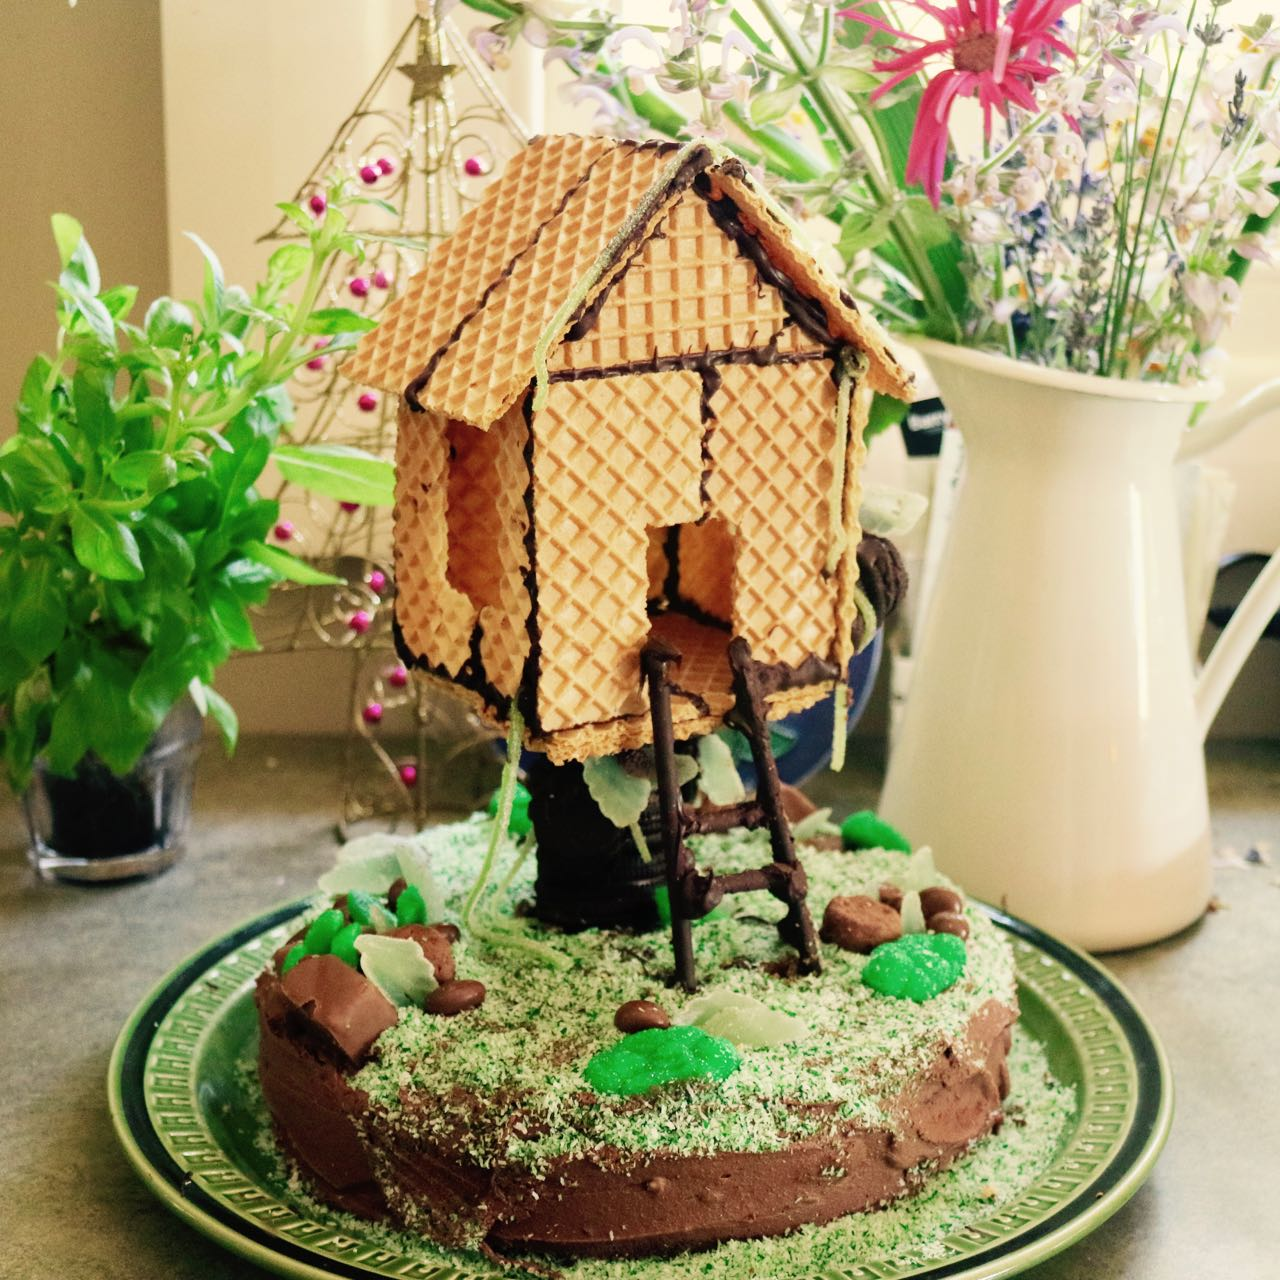 Green Gourmet Giraffe Tree house birthday cake